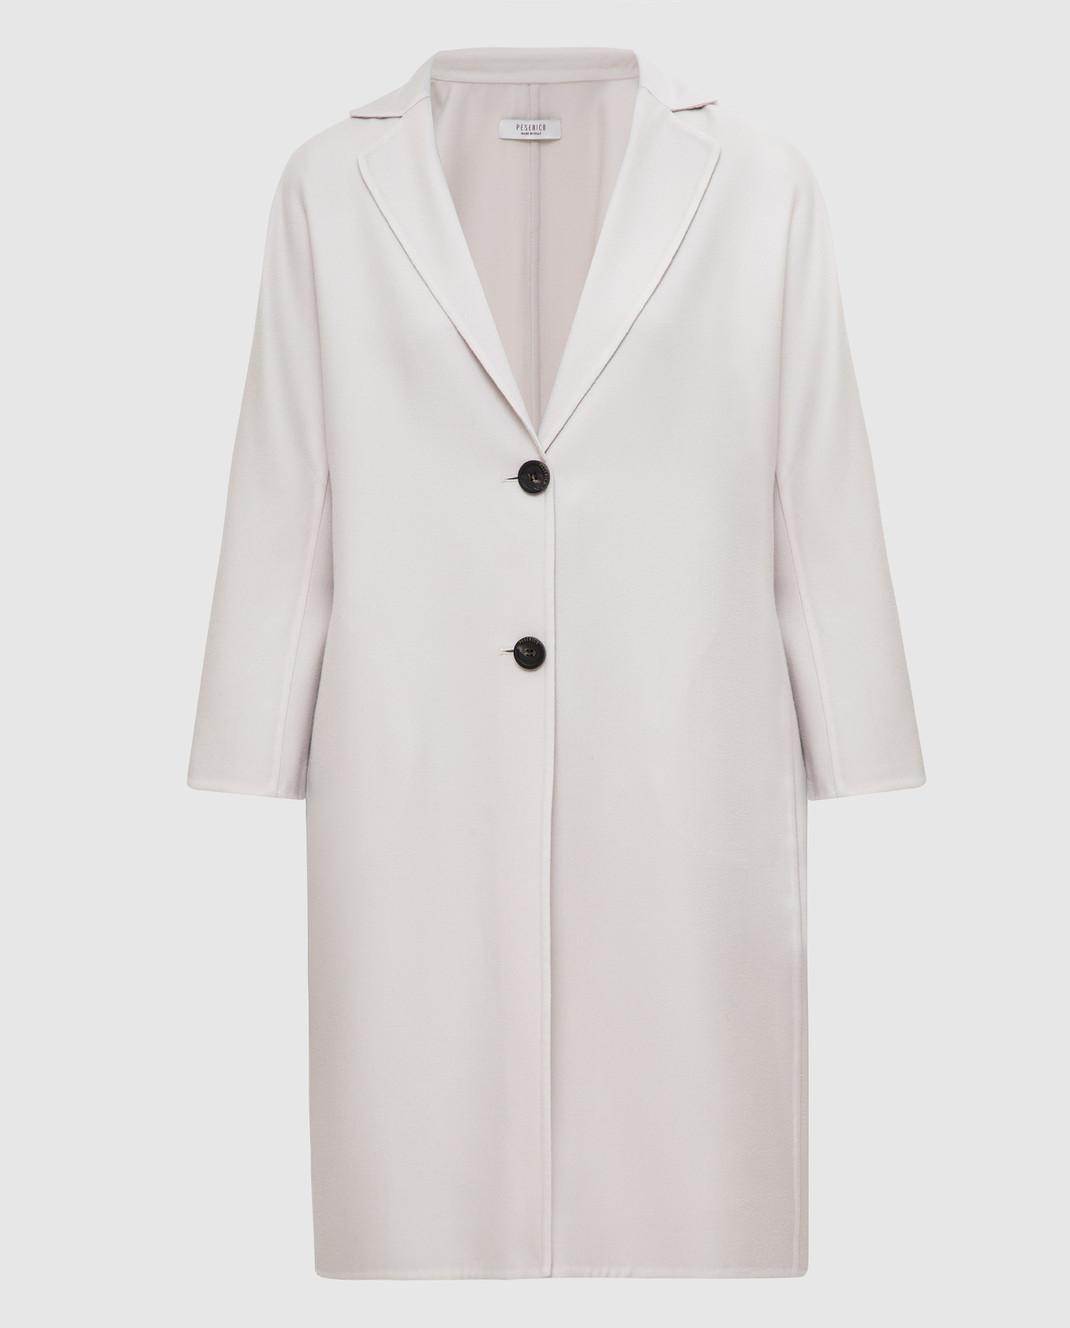 Peserico Светло-бежевое пальто из кашемира и шерсти S20493E